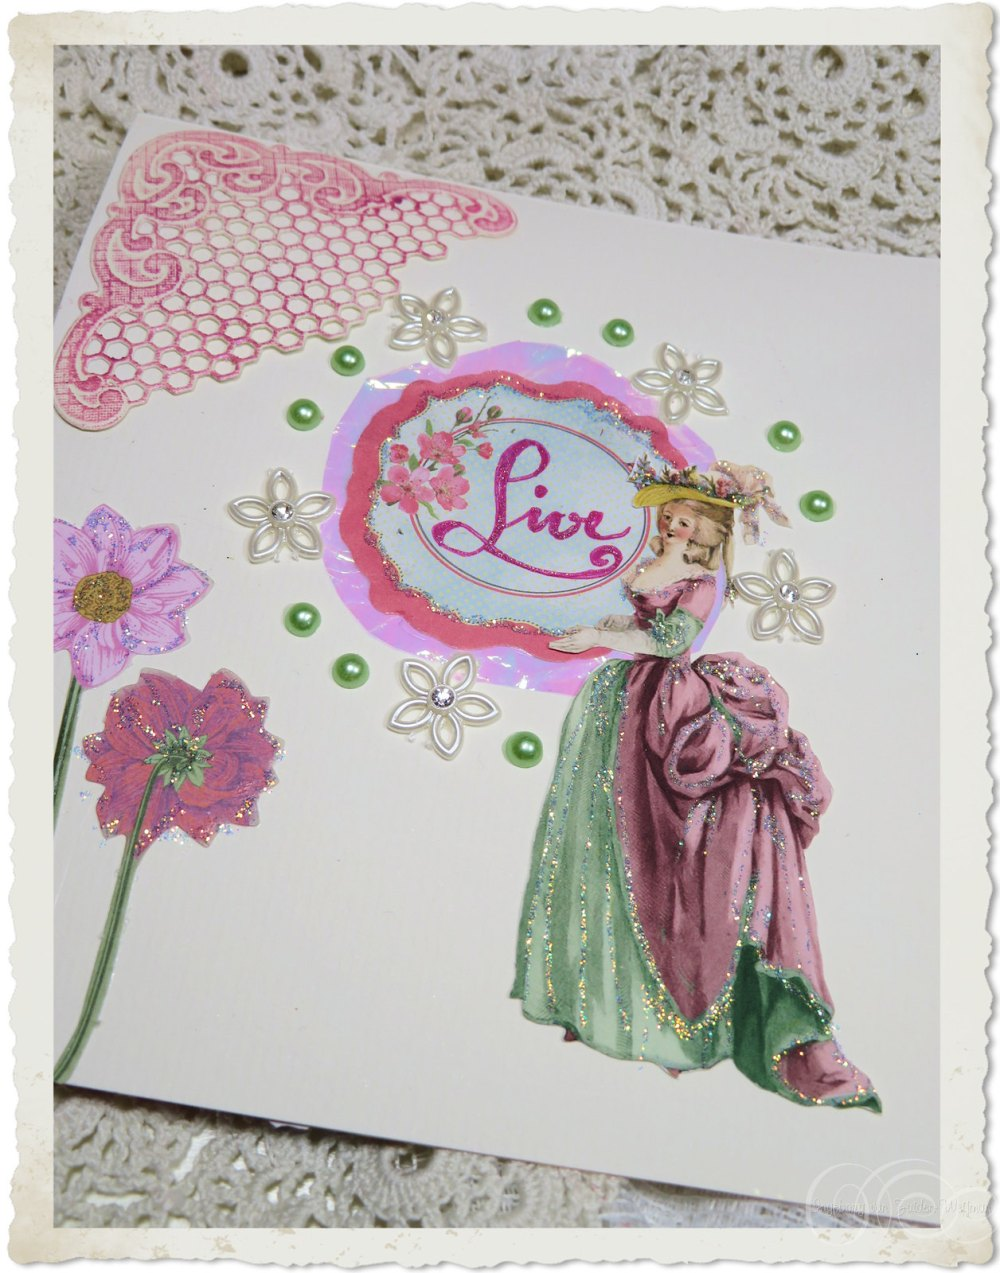 Inside details of Marie card